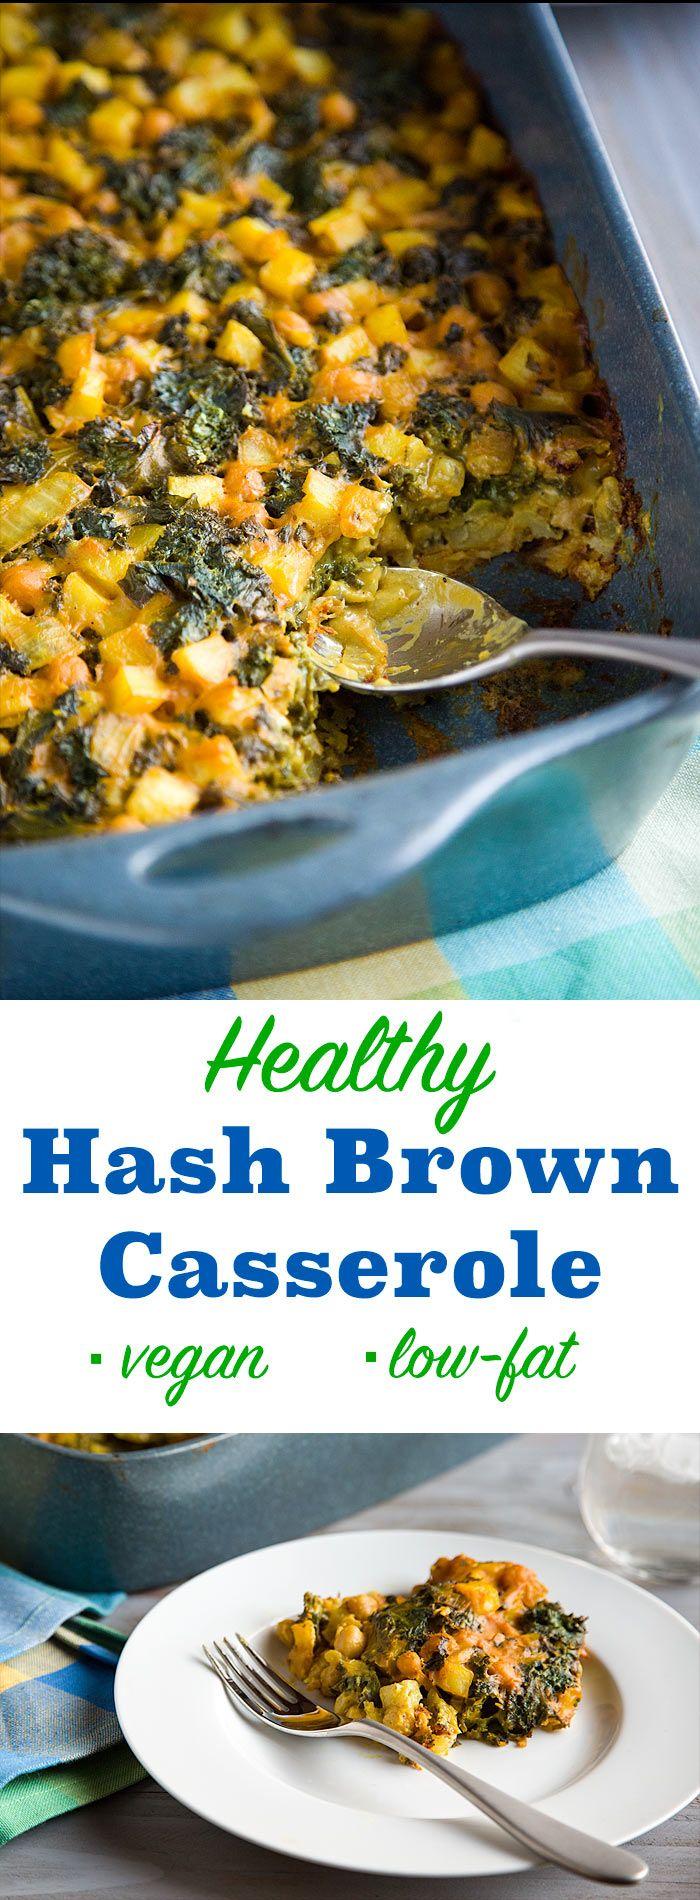 Healthy Hash Brown Casserole